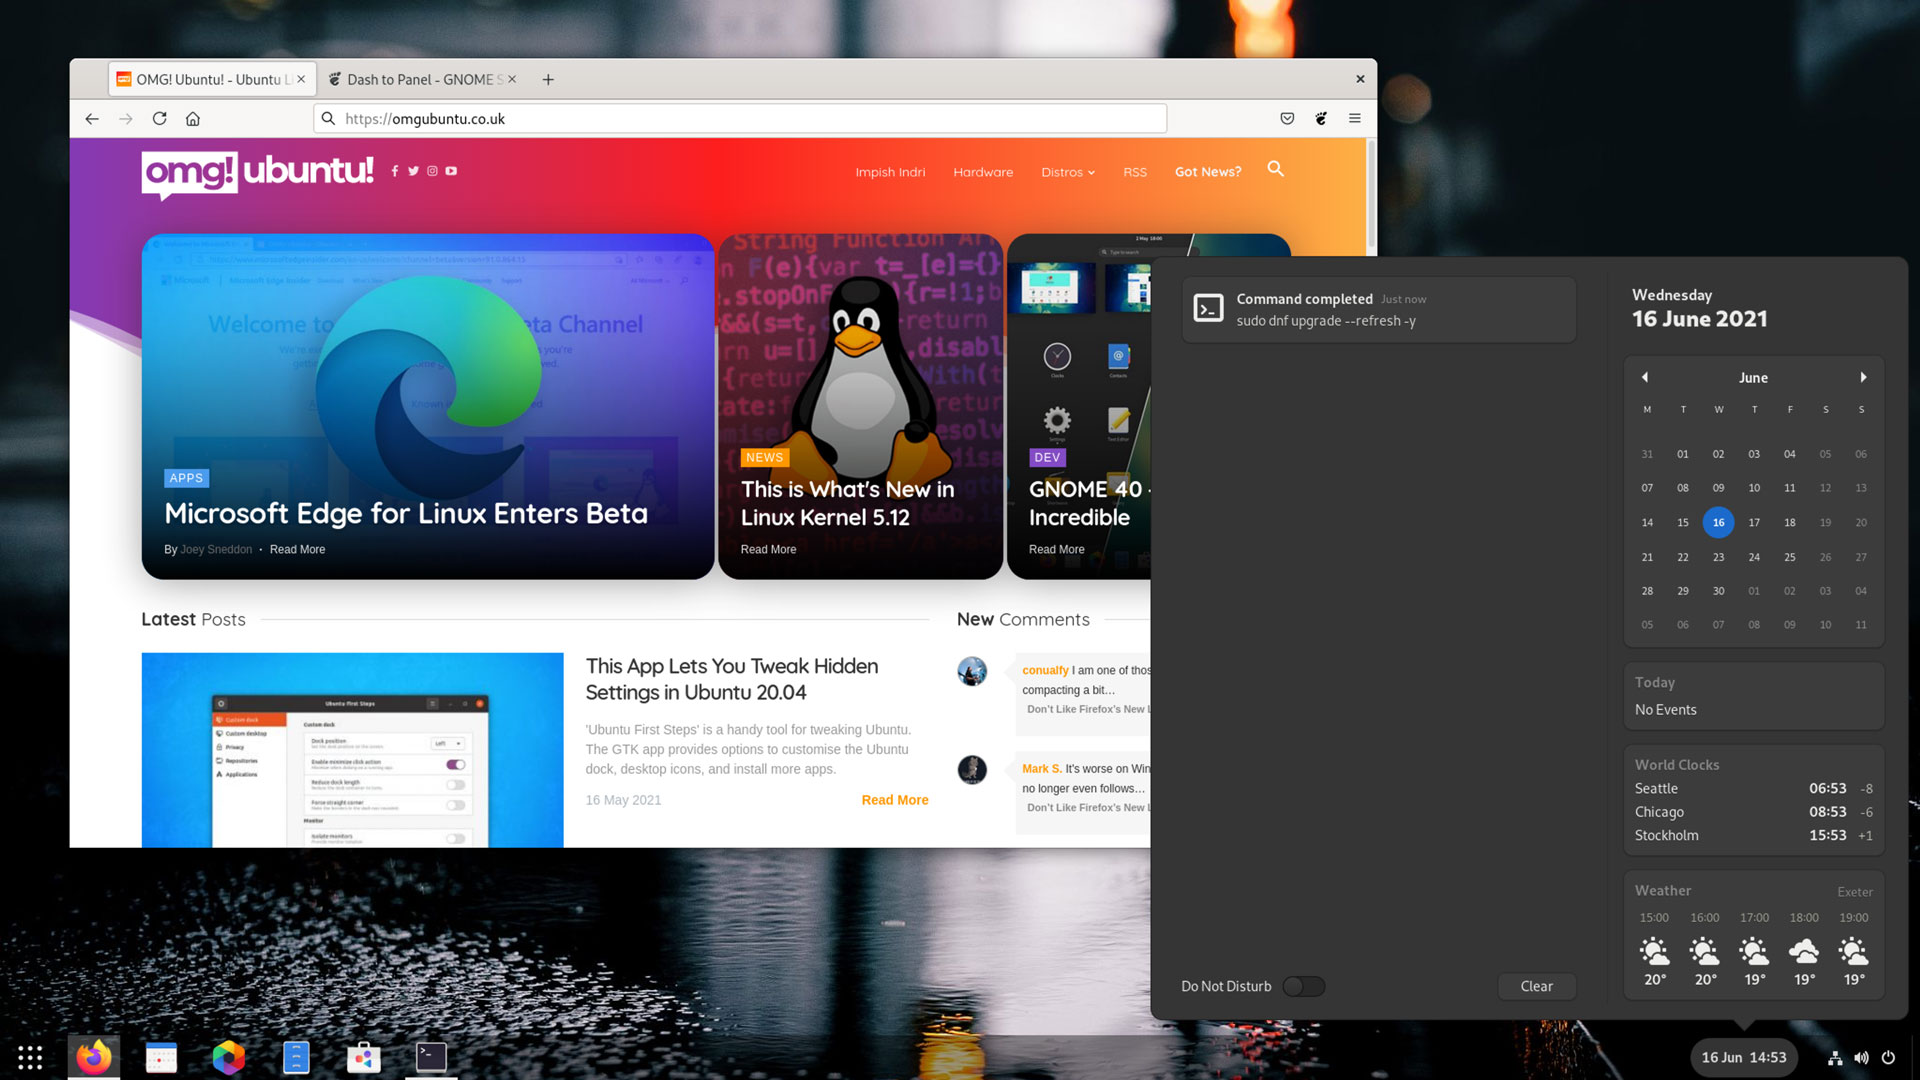 Dash to Panel on GNOME 40